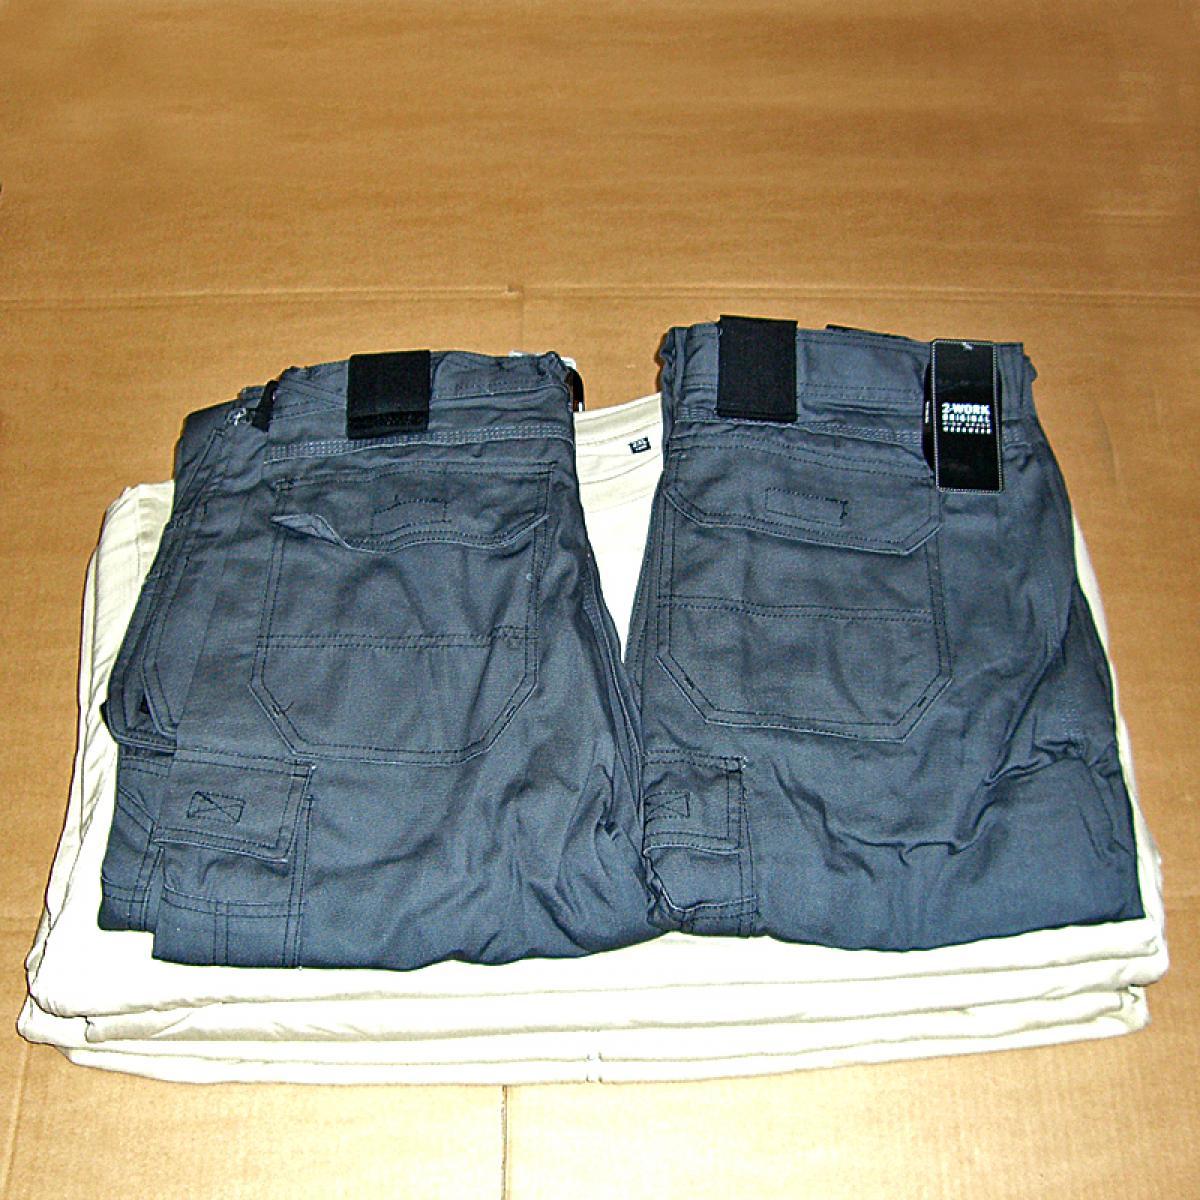 Firmatøj uden tryk ubrugt: 2 Stk. RIO bukser , GRÅ , str. 54